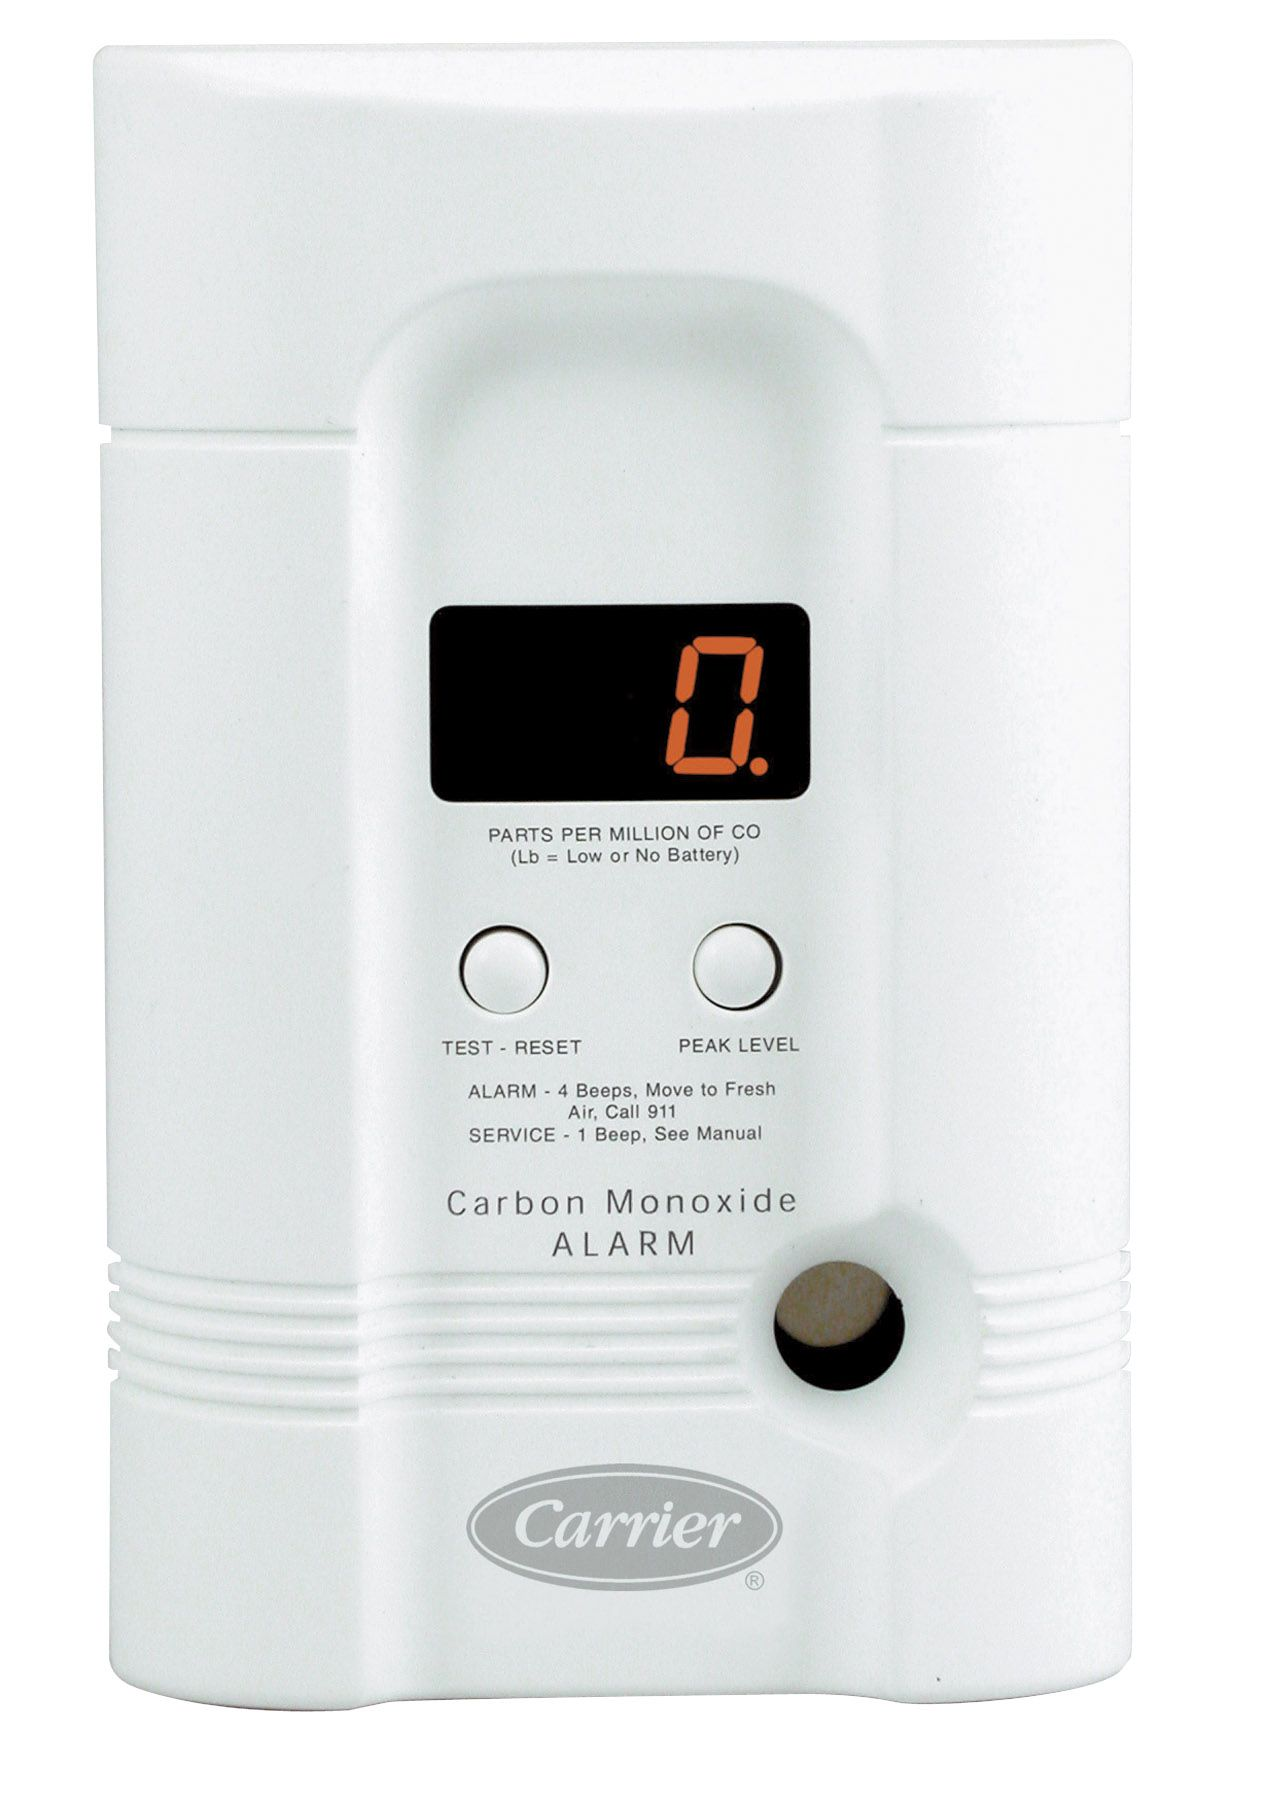 Carbon Monoxide Alarm Carbon monoxide alarms, Carbon